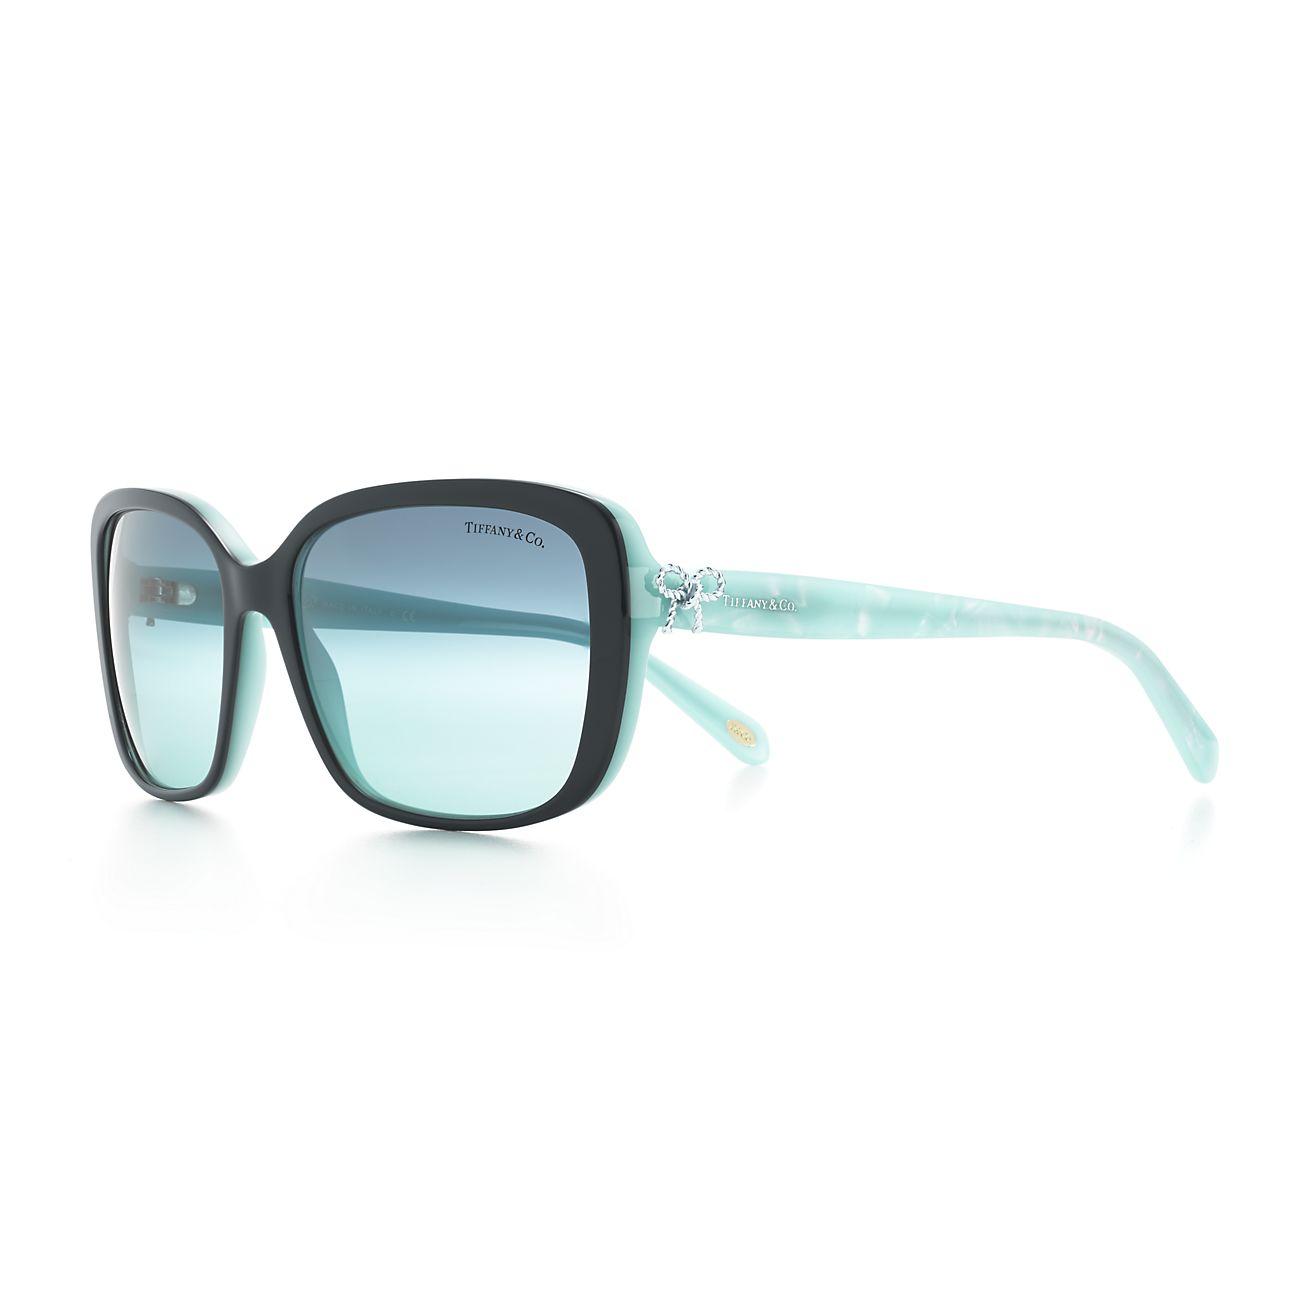 Tiffany Twist square bow sunglasses in black and Tiffany ...